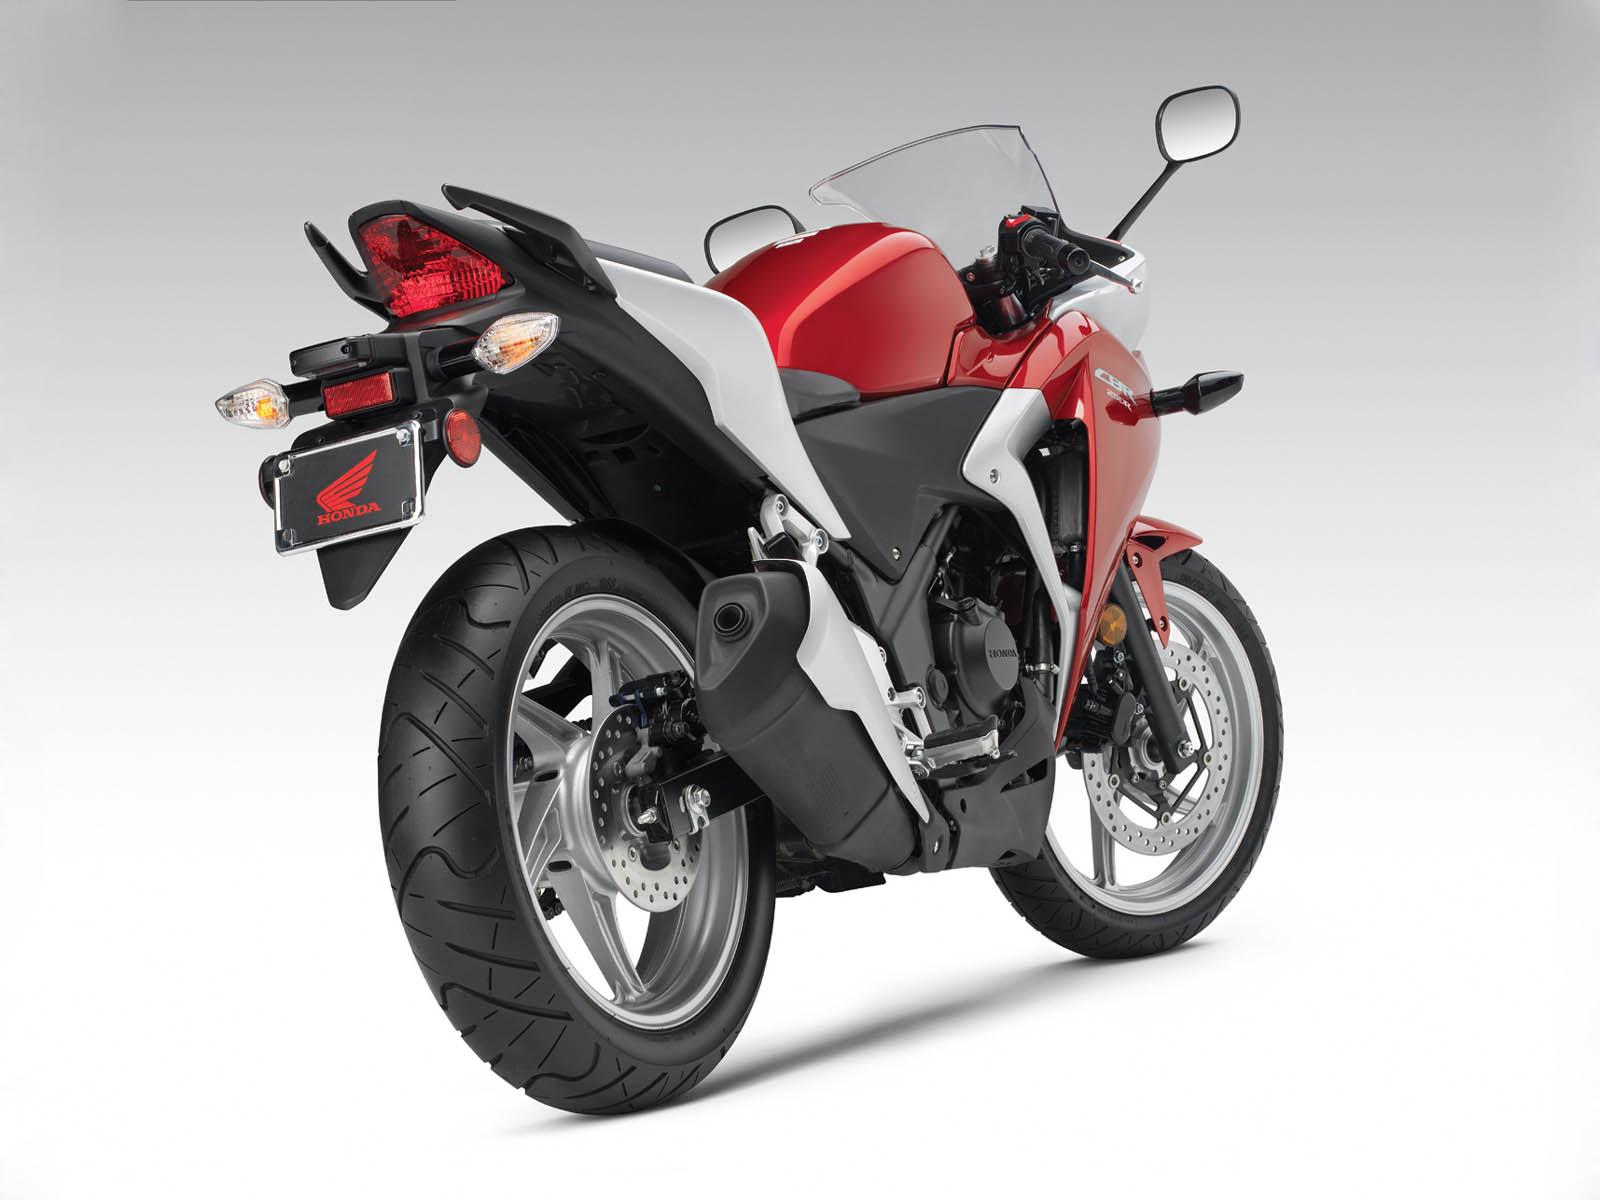 http://3.bp.blogspot.com/-JGxgIIZ0j98/UBa8CIMyB2I/AAAAAAAAG48/BT9UsKLpZs8/s1600/Honda+CBR+250R+Bike+Wallpapers+3.jpg